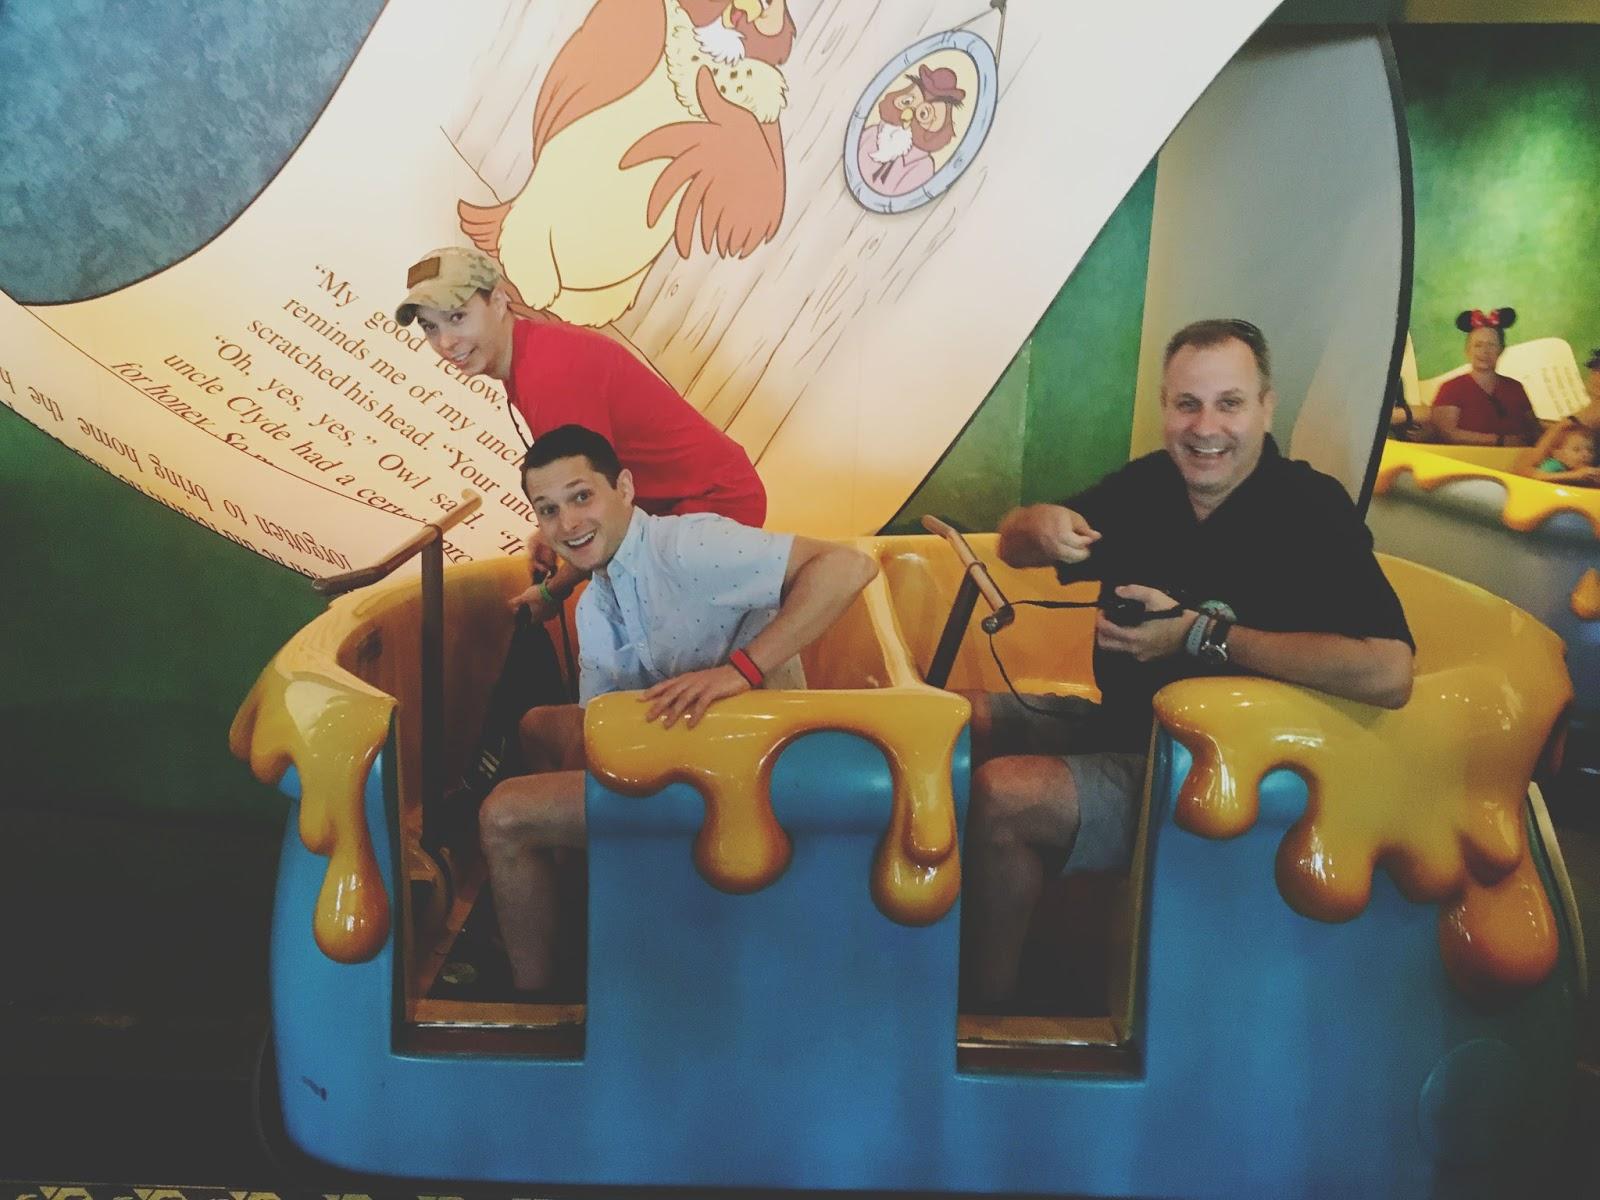 Winnie the Pooh ride at Magic Kingdom in Disney World, Florida